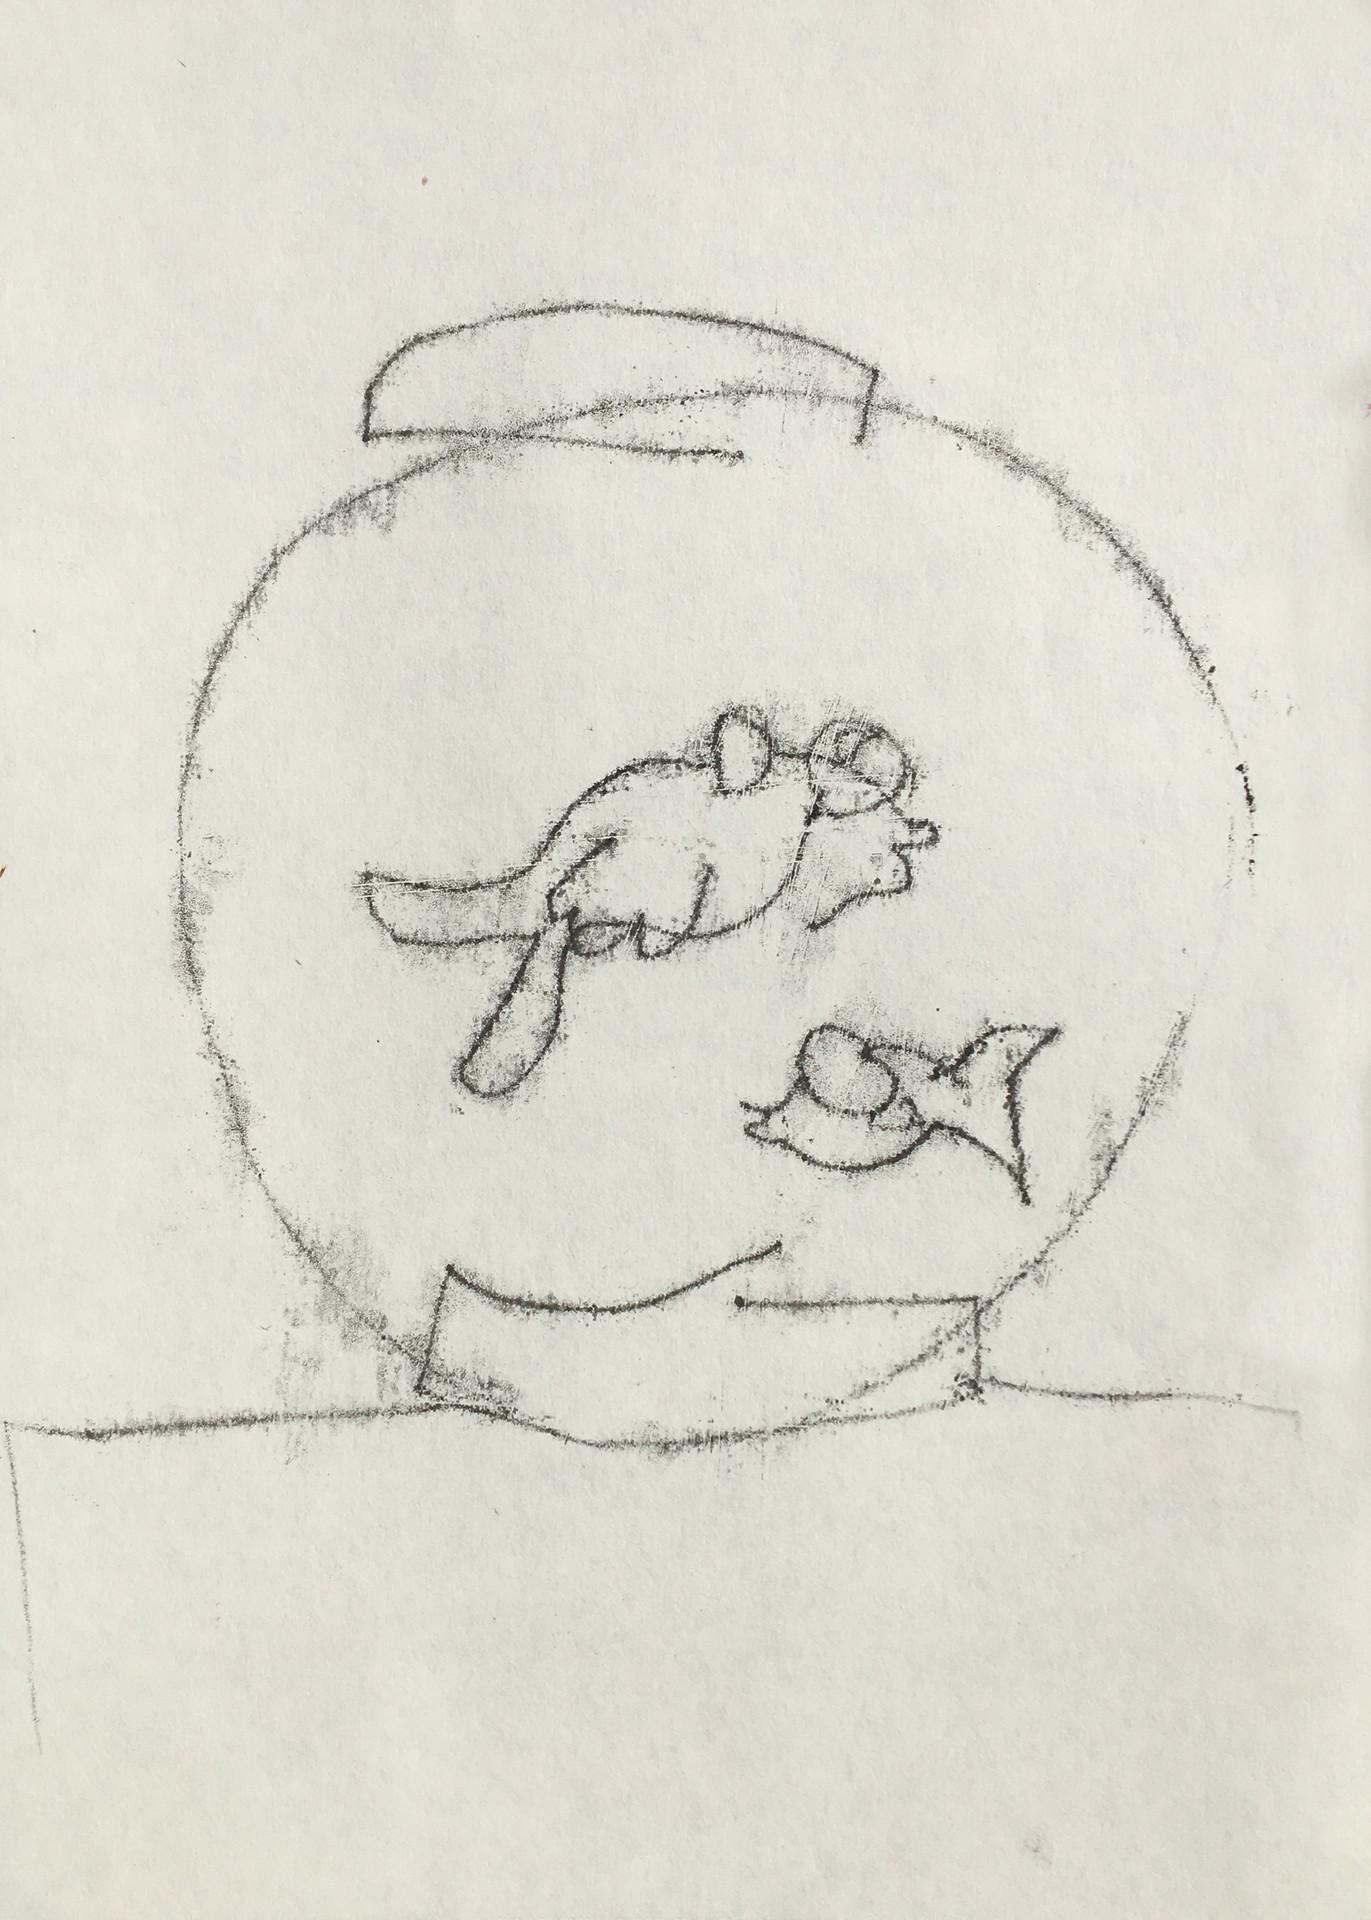 Fish, 2020, mono print on paper, 21 x 29.5 cm